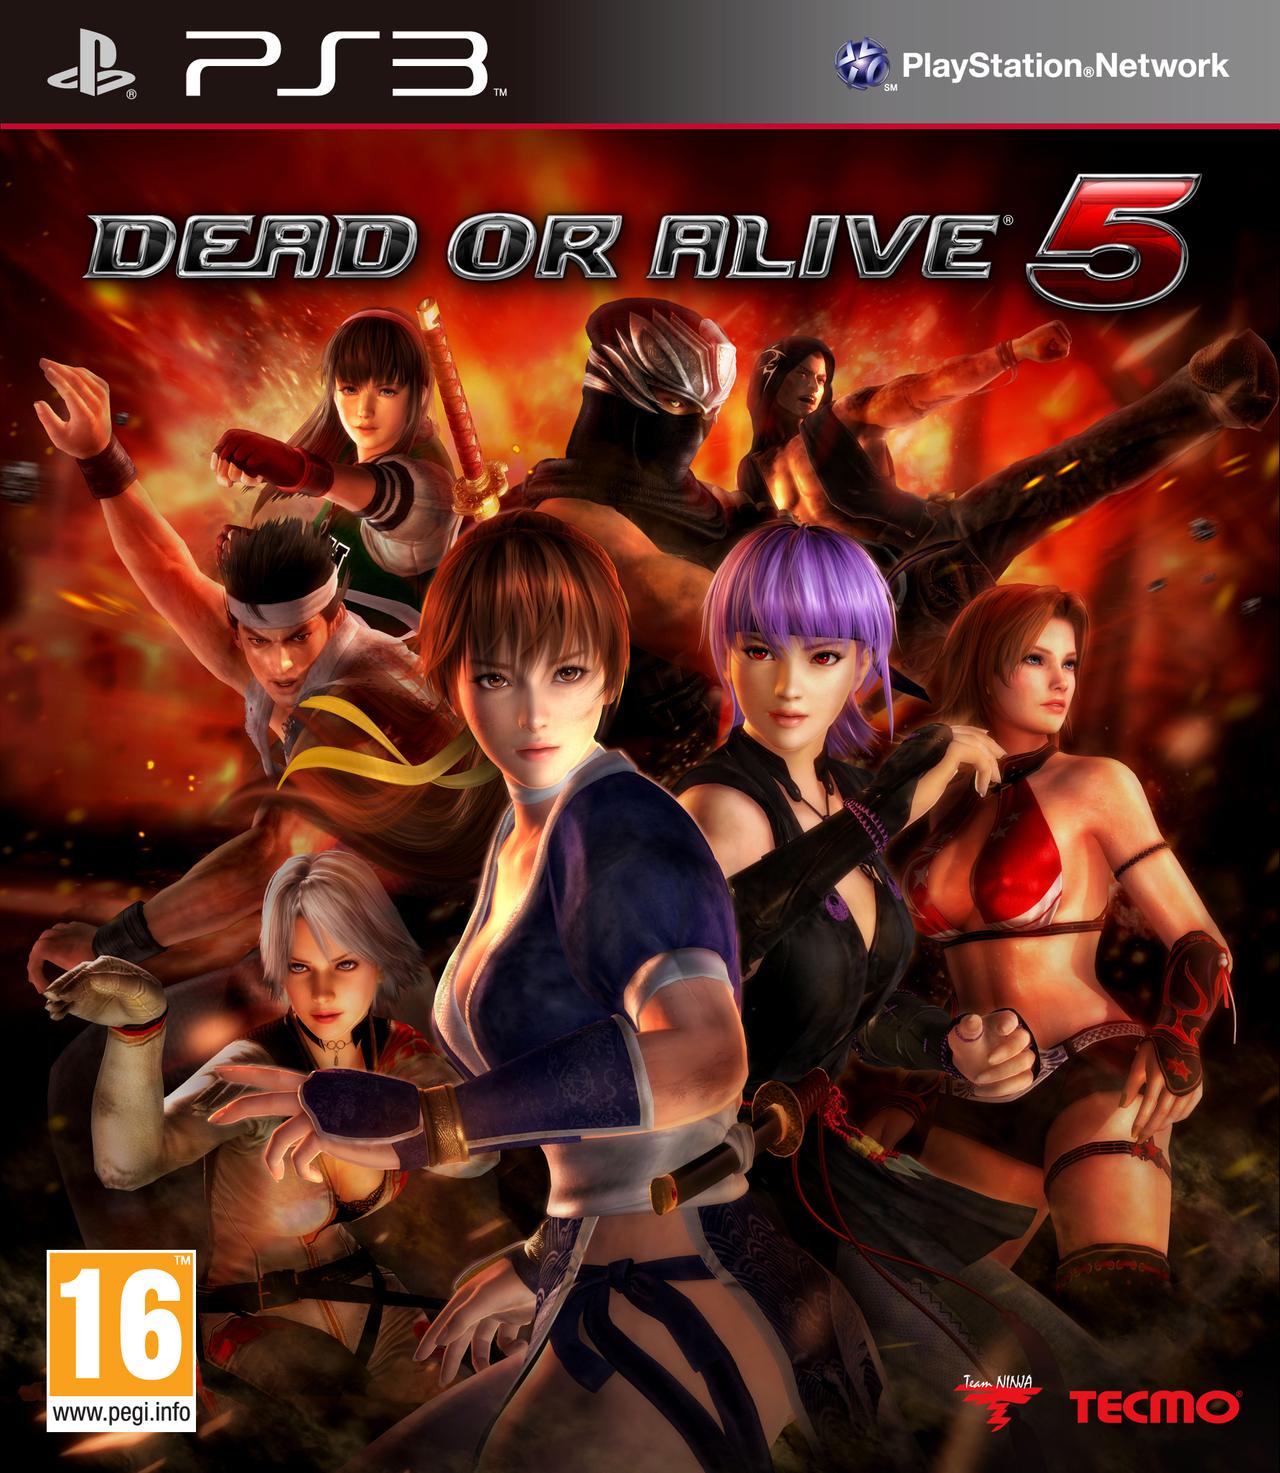 https://i0.wp.com/image.jeuxvideo.com/images/jaquettes/00035682/jaquette-dead-or-alive-5-playstation-3-ps3-cover-avant-g-1345551645.jpg